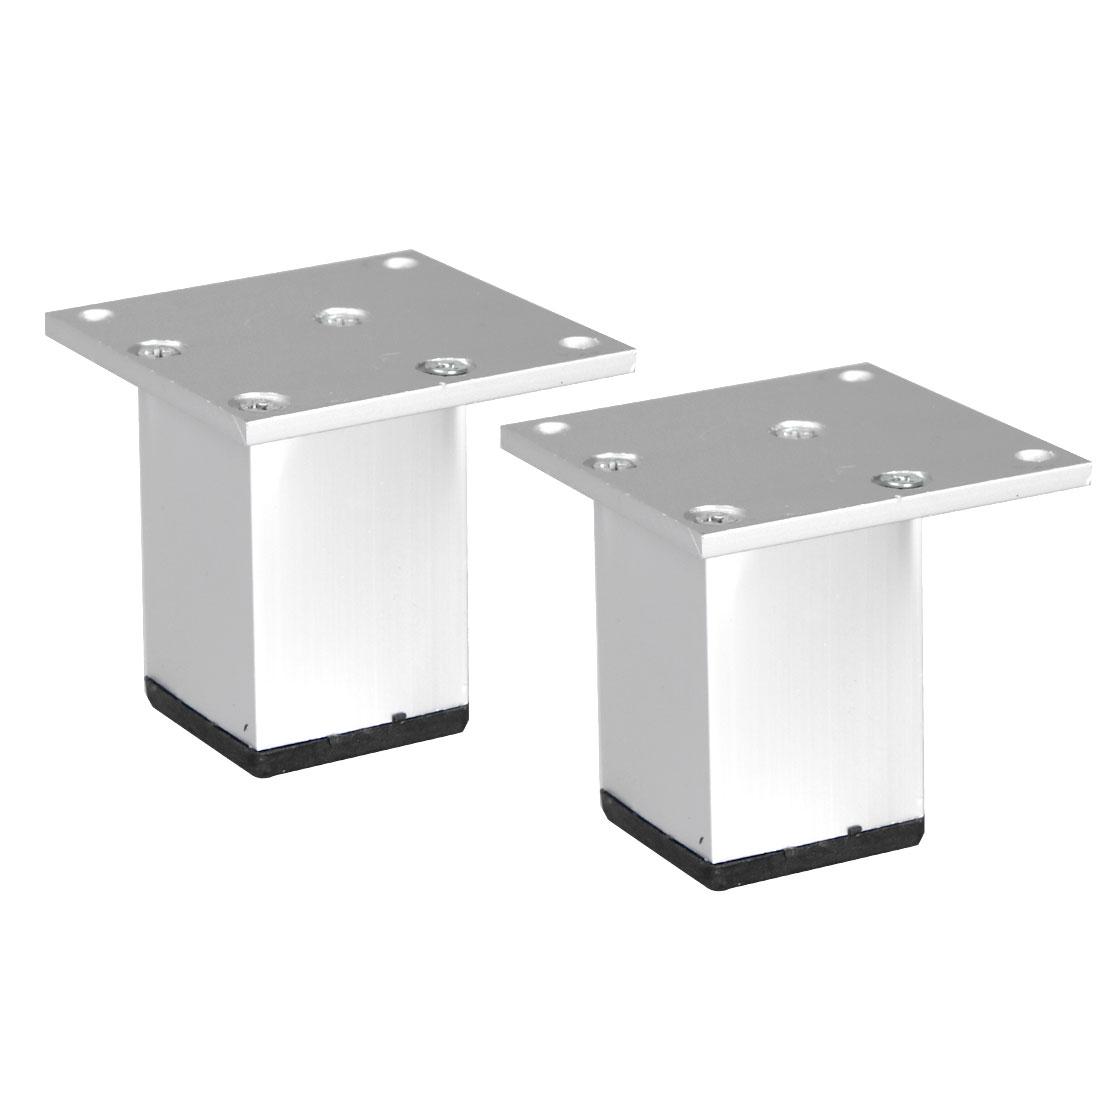 "2.4"" Furniture Legs Aluminium Alloy Table Feet Replacement Height Adjuster 2pcs"